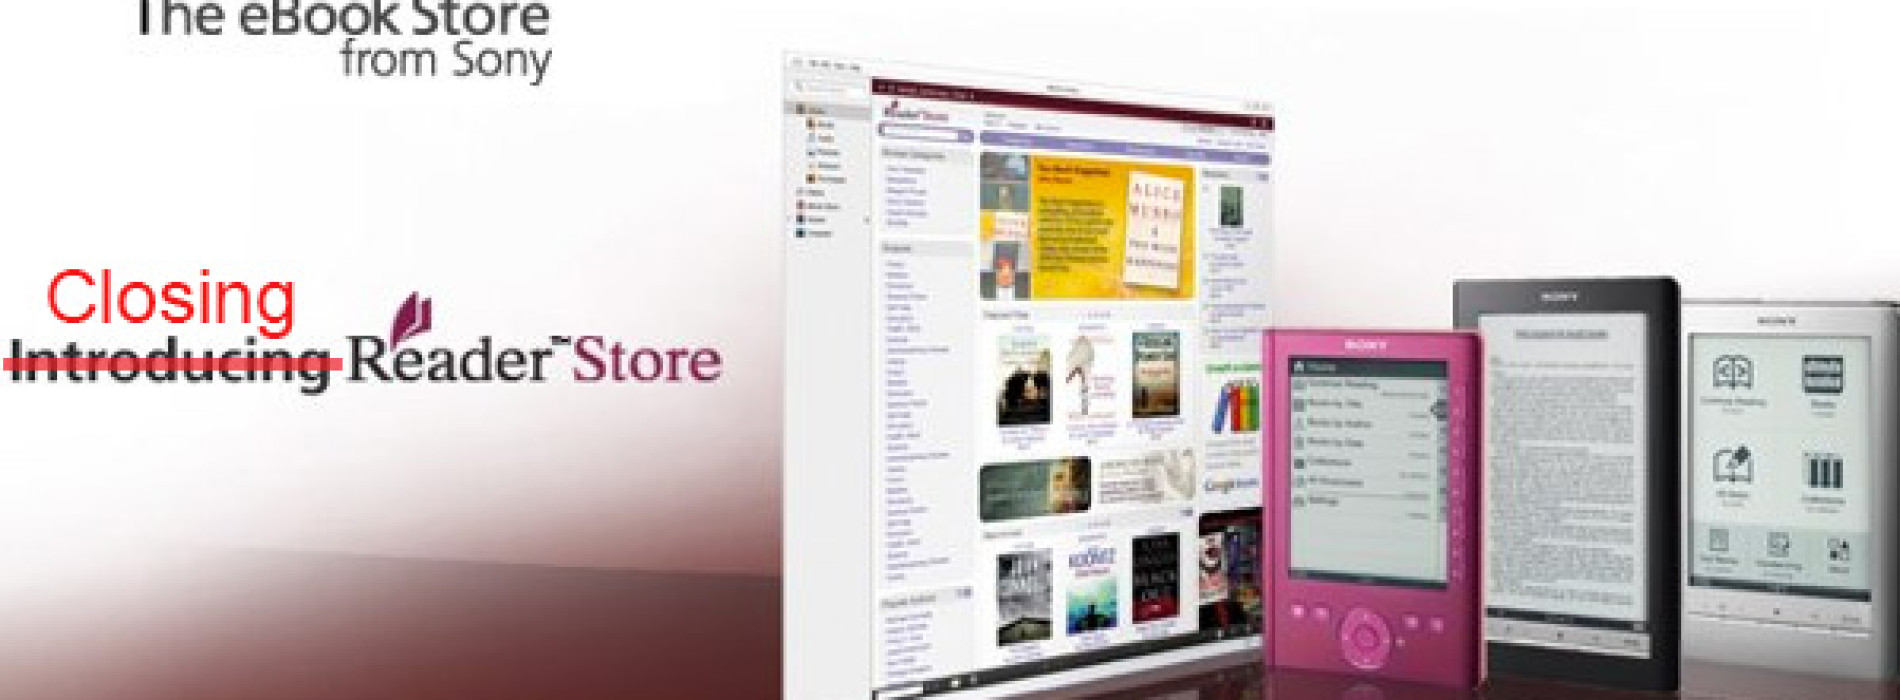 Sony ruší obchody Reader Store – konec ebook čteček Sony?